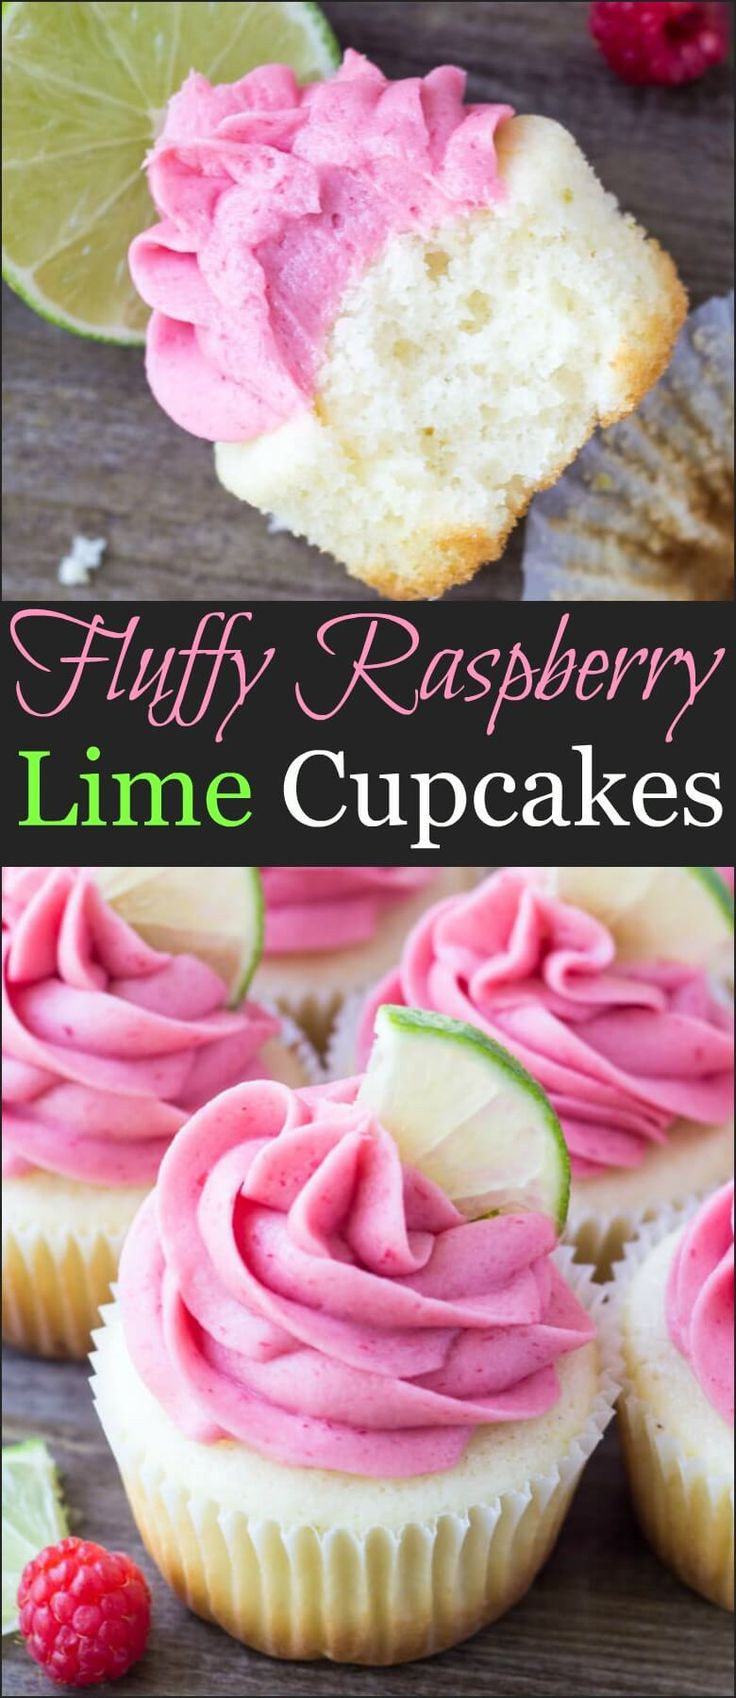 Summer Cupcakes Flavors  Best 25 Summer cupcake flavors ideas on Pinterest